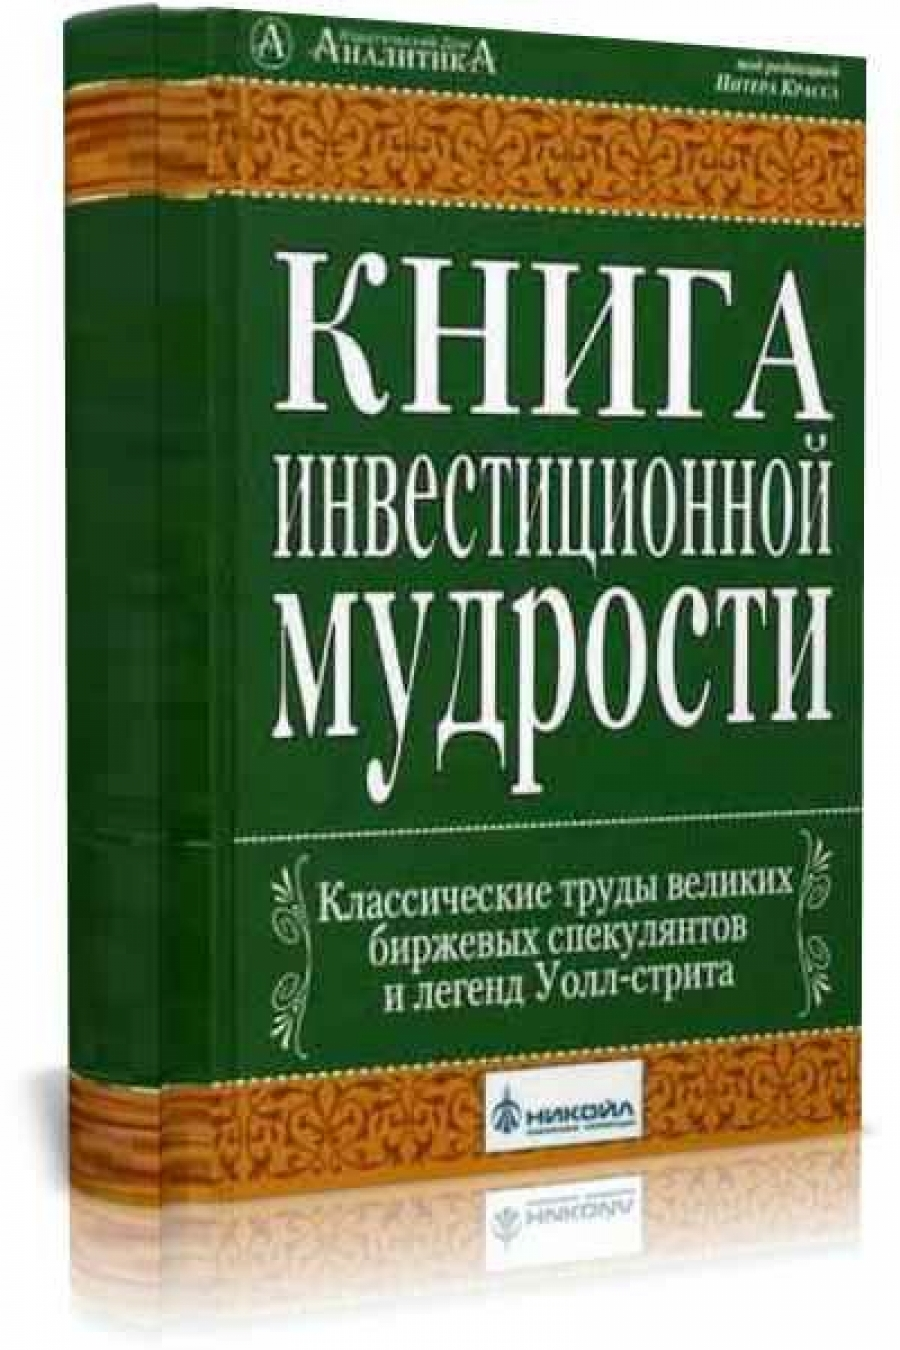 Обложка книги:  питер красс - книга инвестиционной мудрости